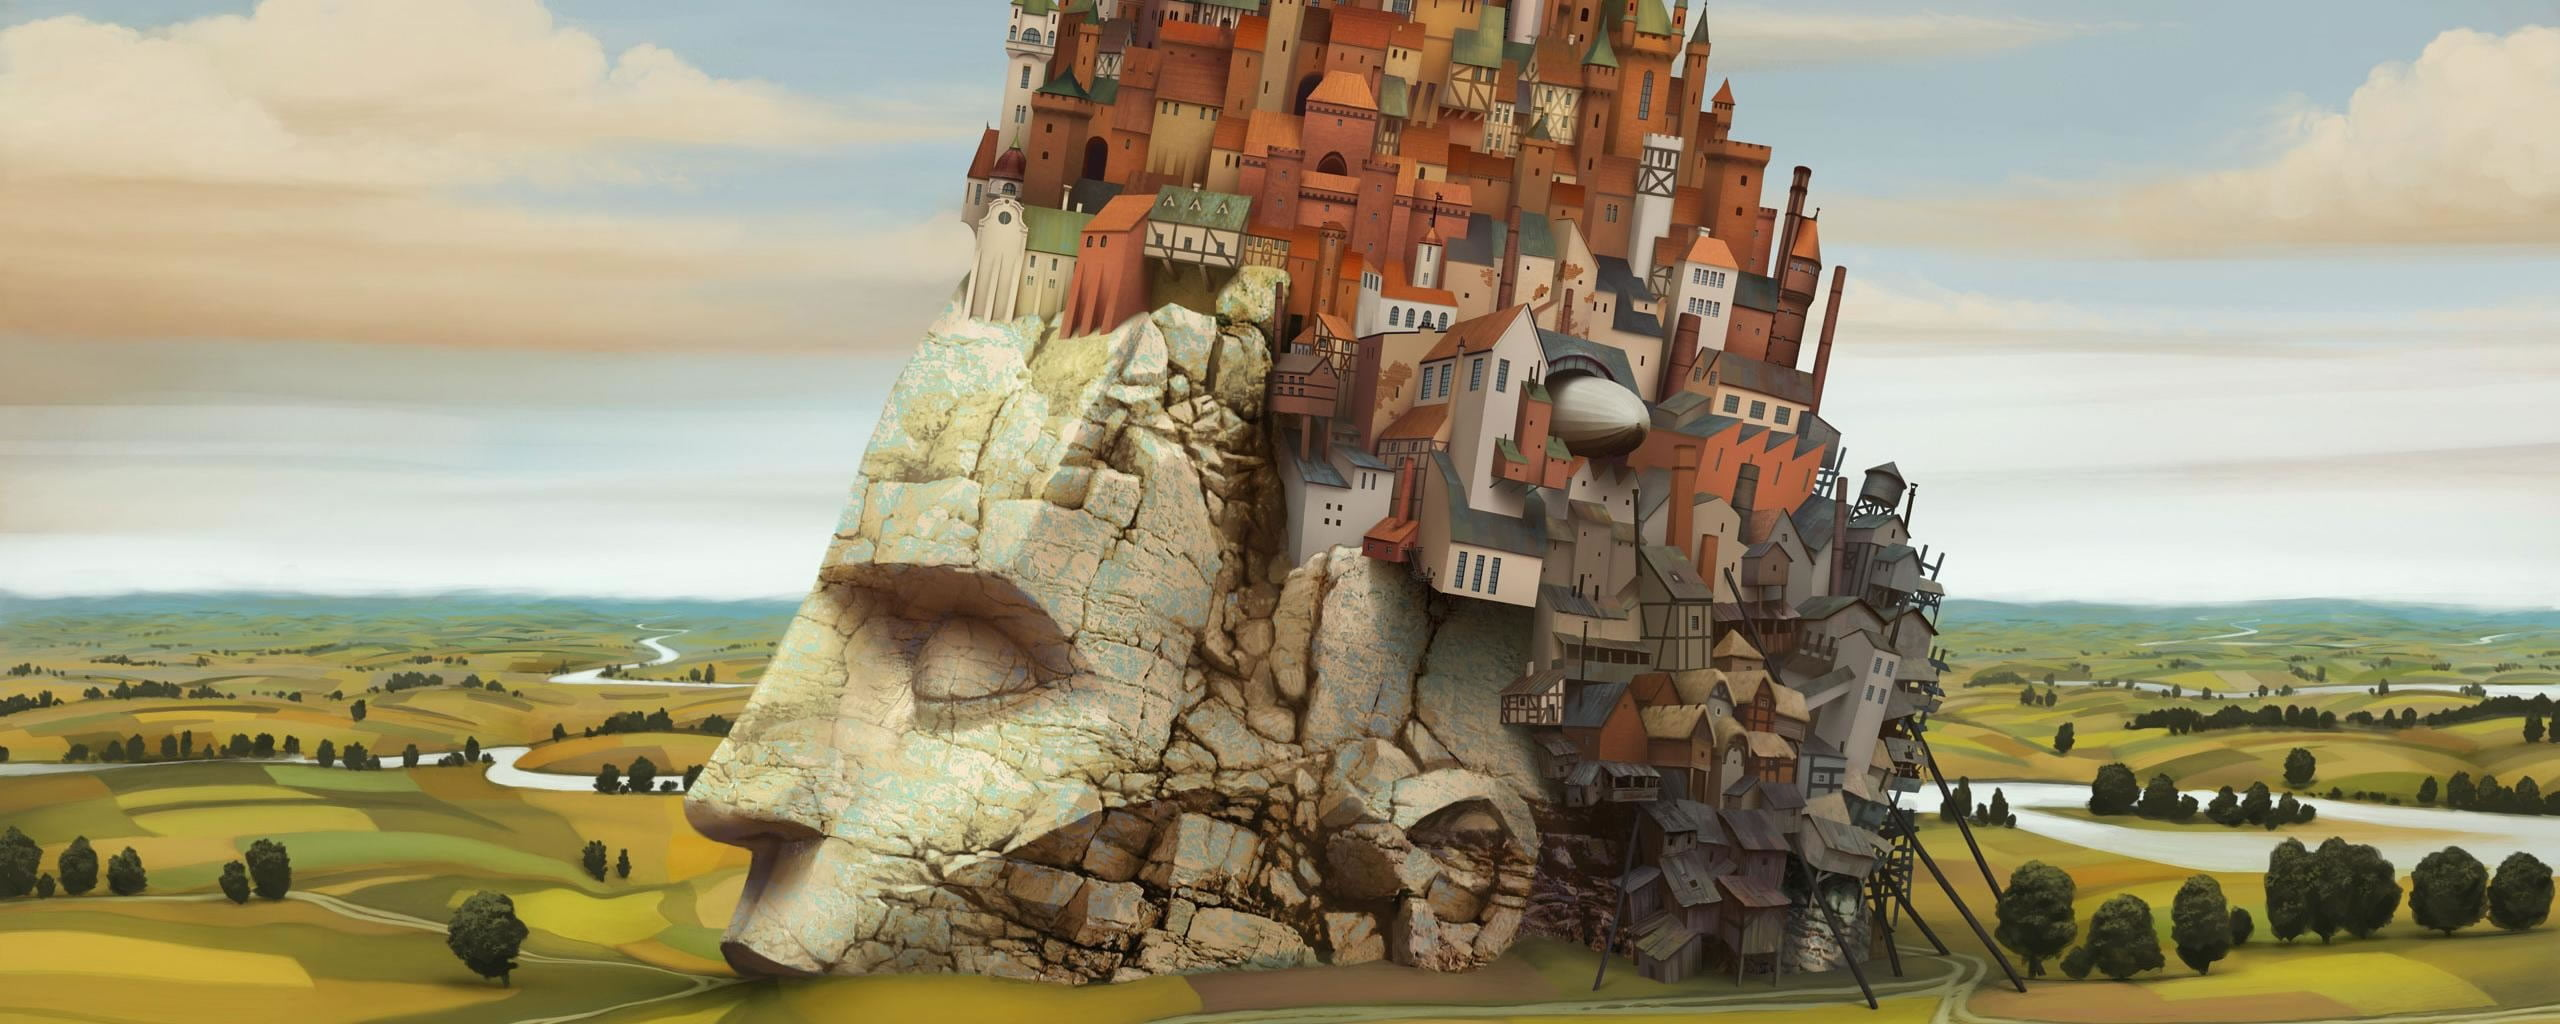 besplatne pozadine za dva monitora stone head city